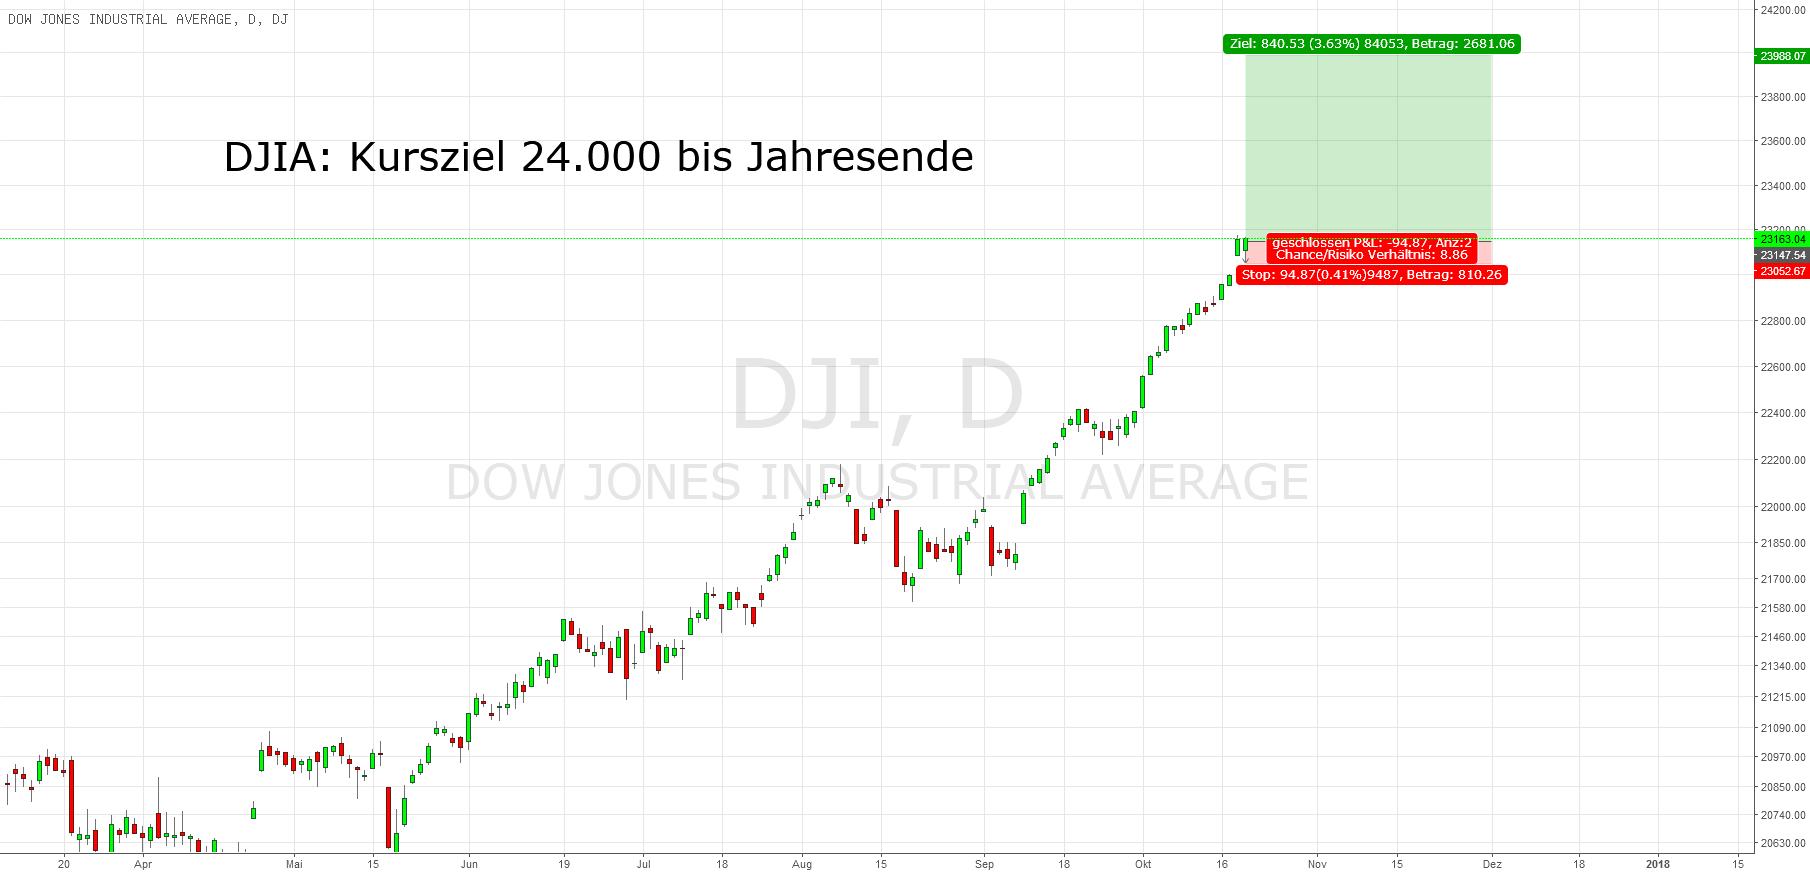 DJIA: Unstoppable. Kursziel 24.000